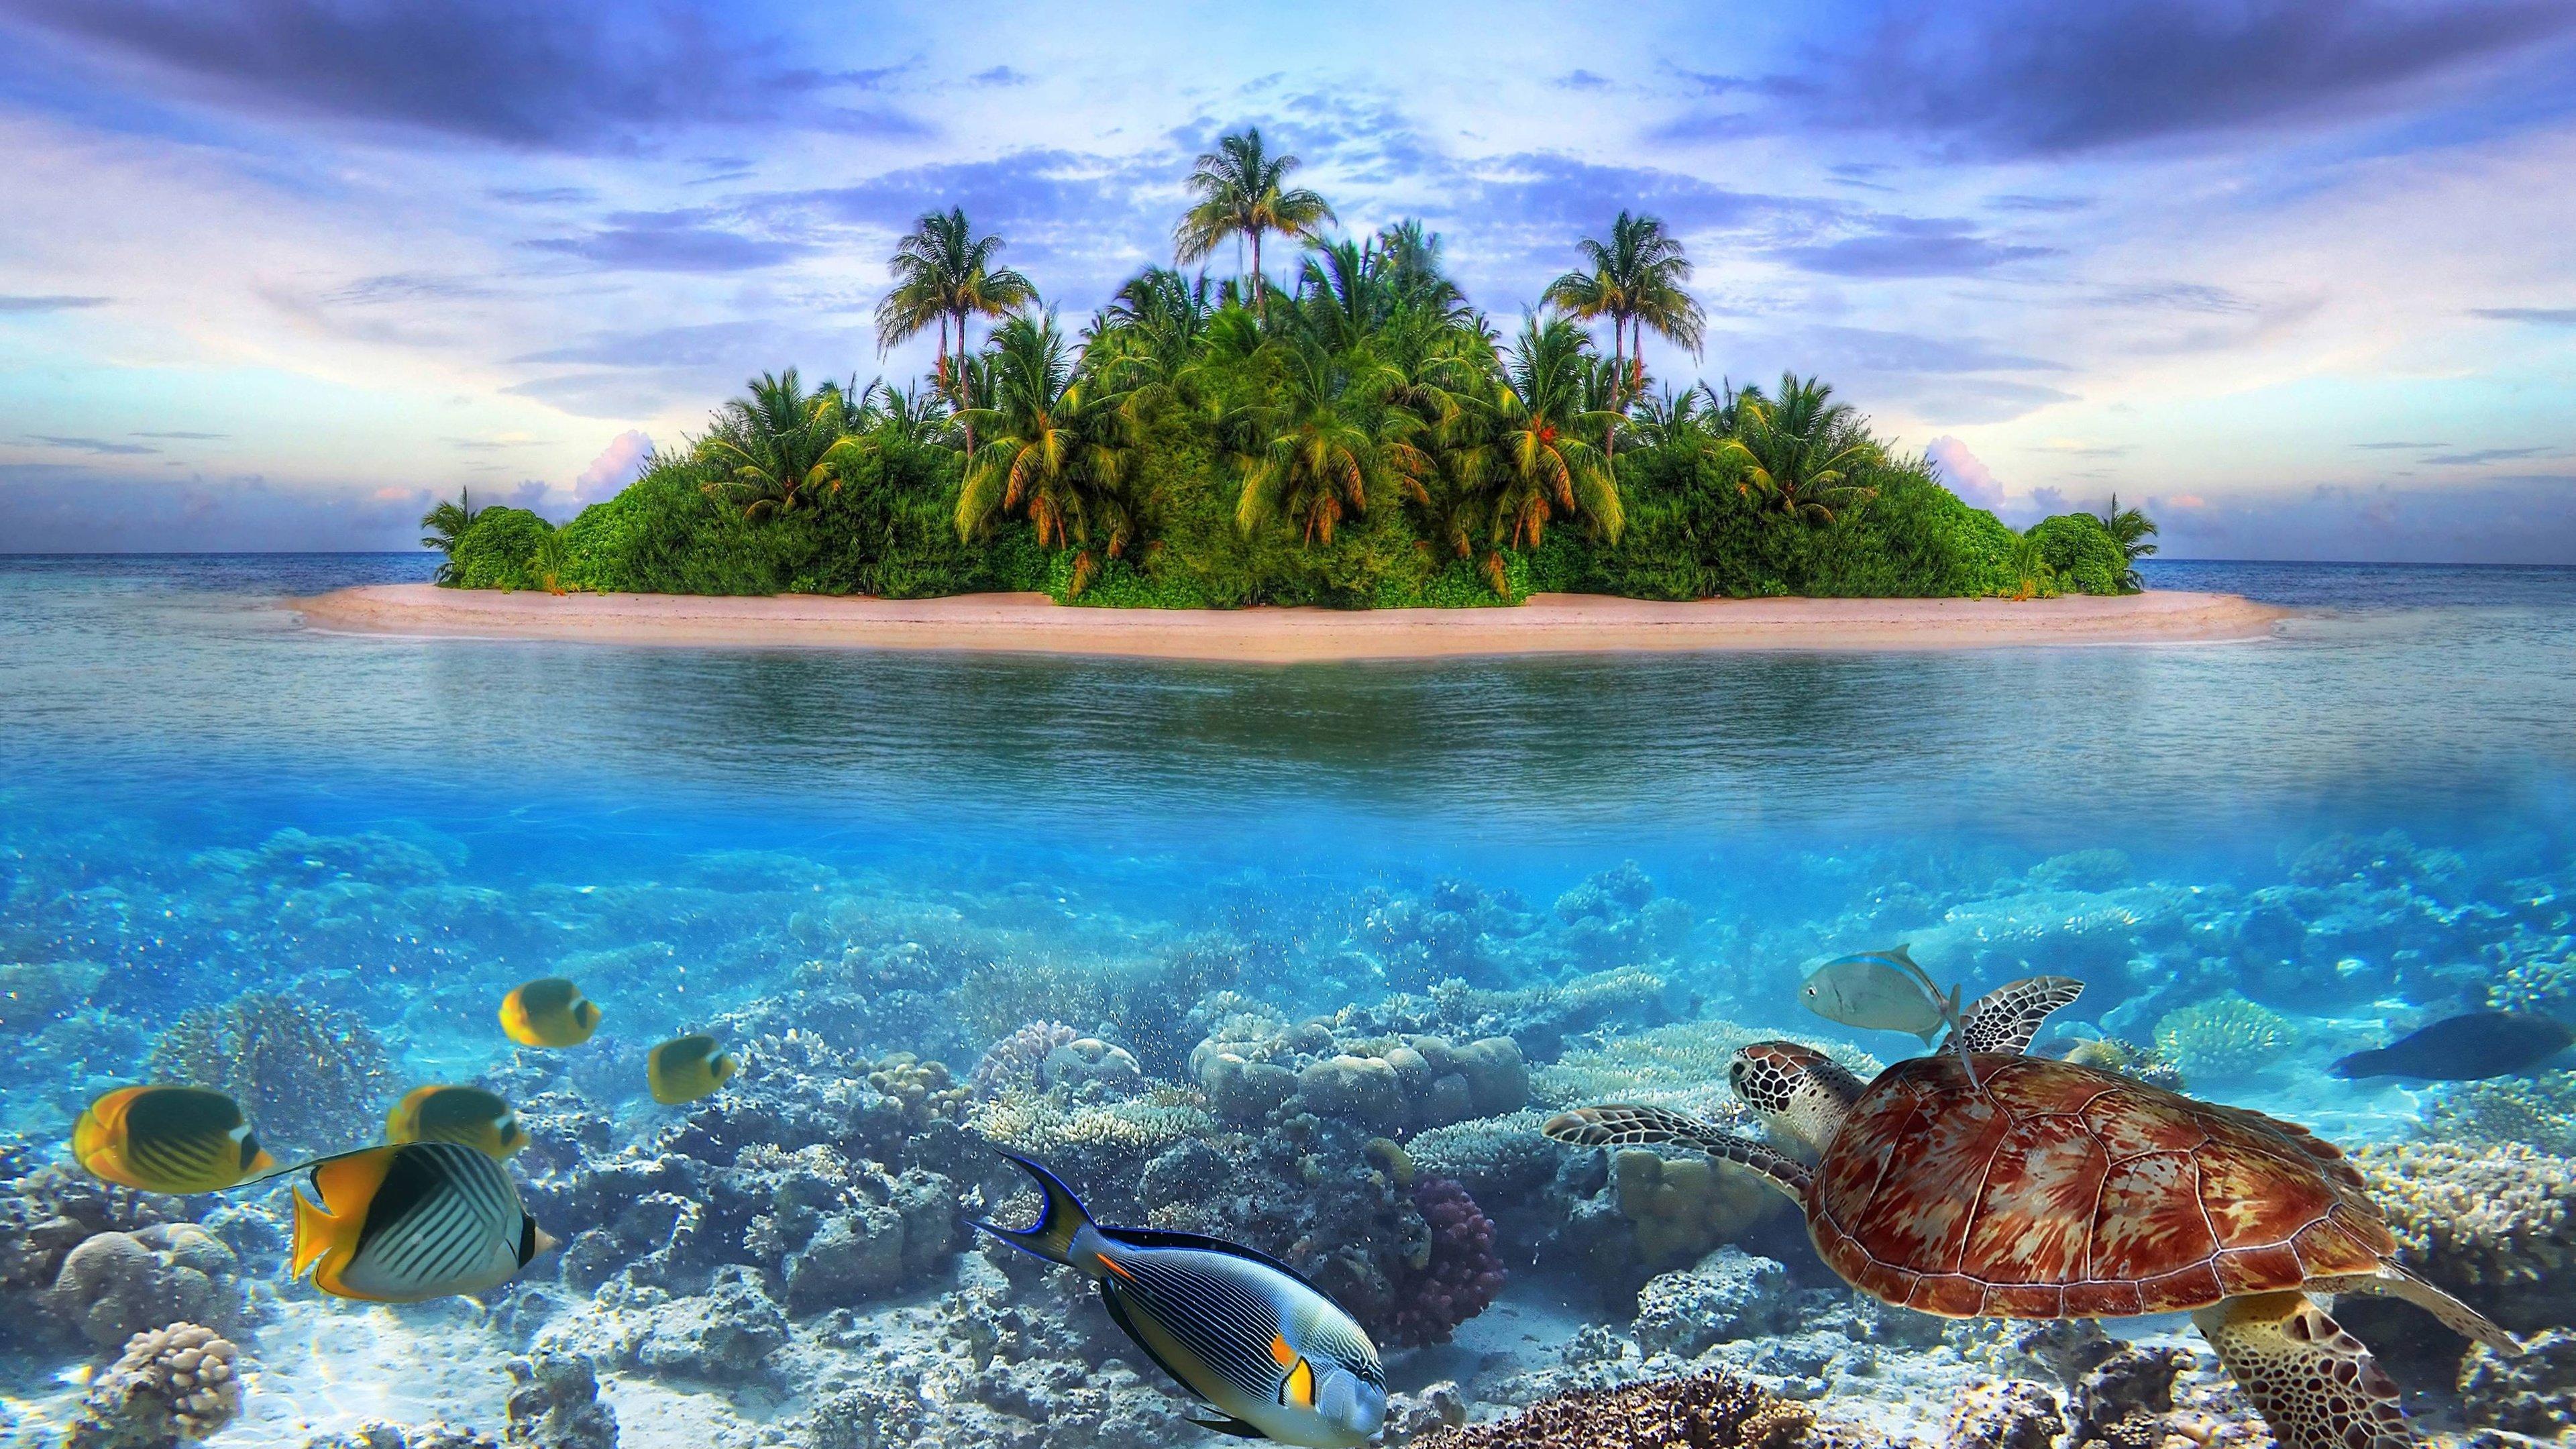 Marine life Tropical island Ultra HD 4k Wallpaper   HD Wallpapers 3840x2160